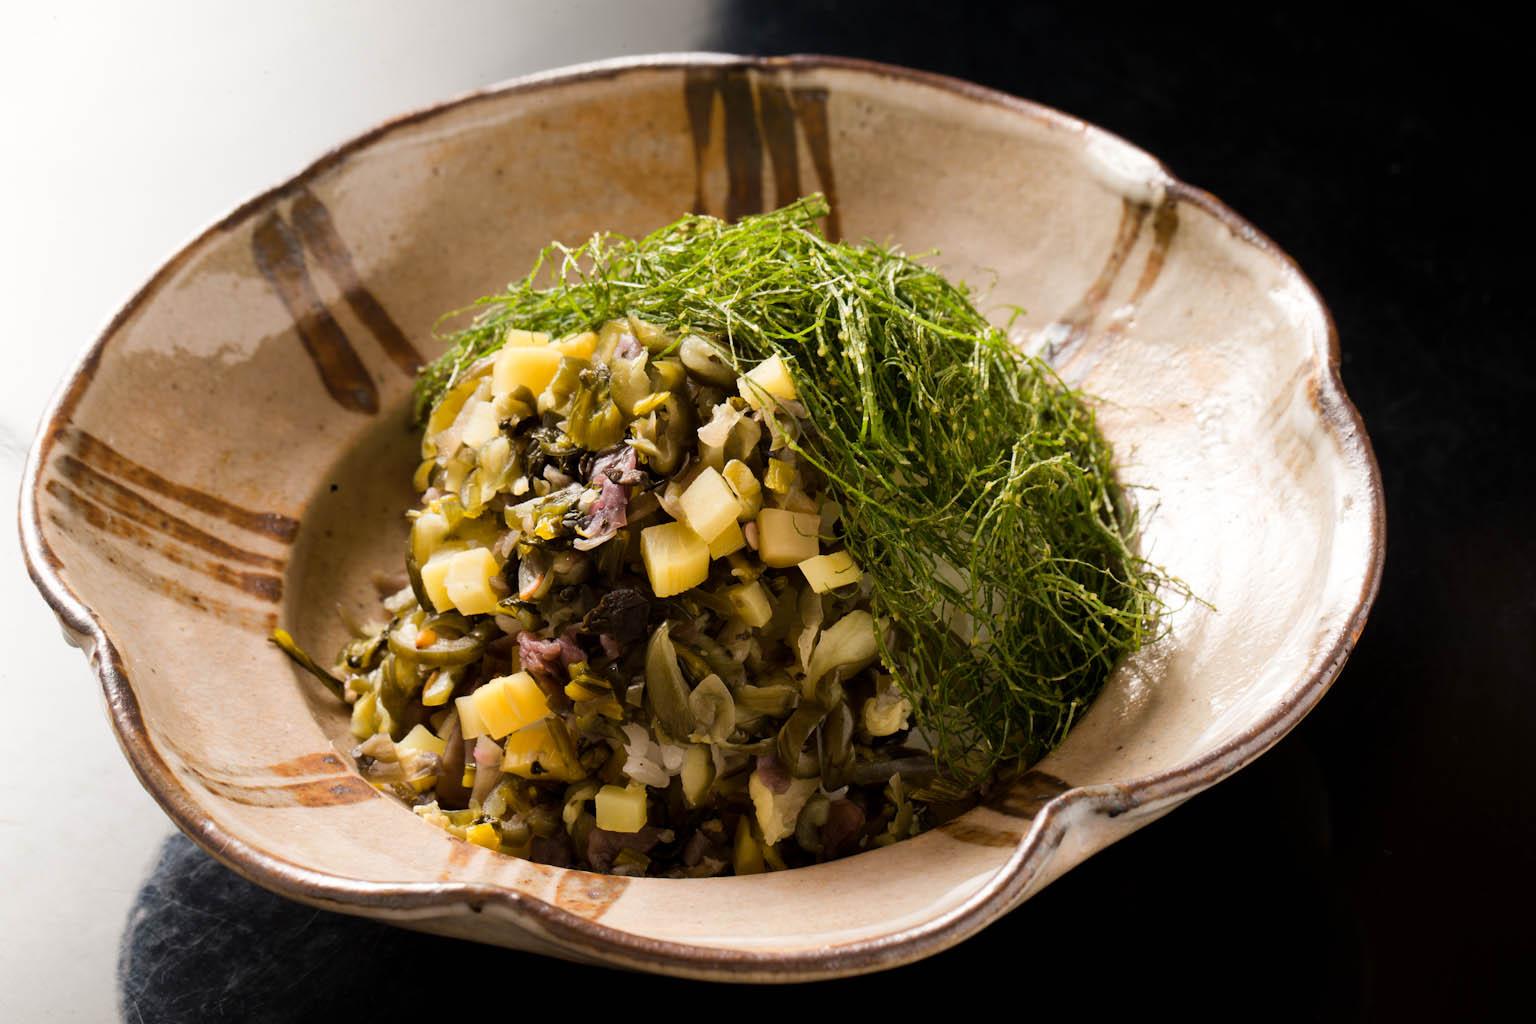 CHIHANA cuisine #1